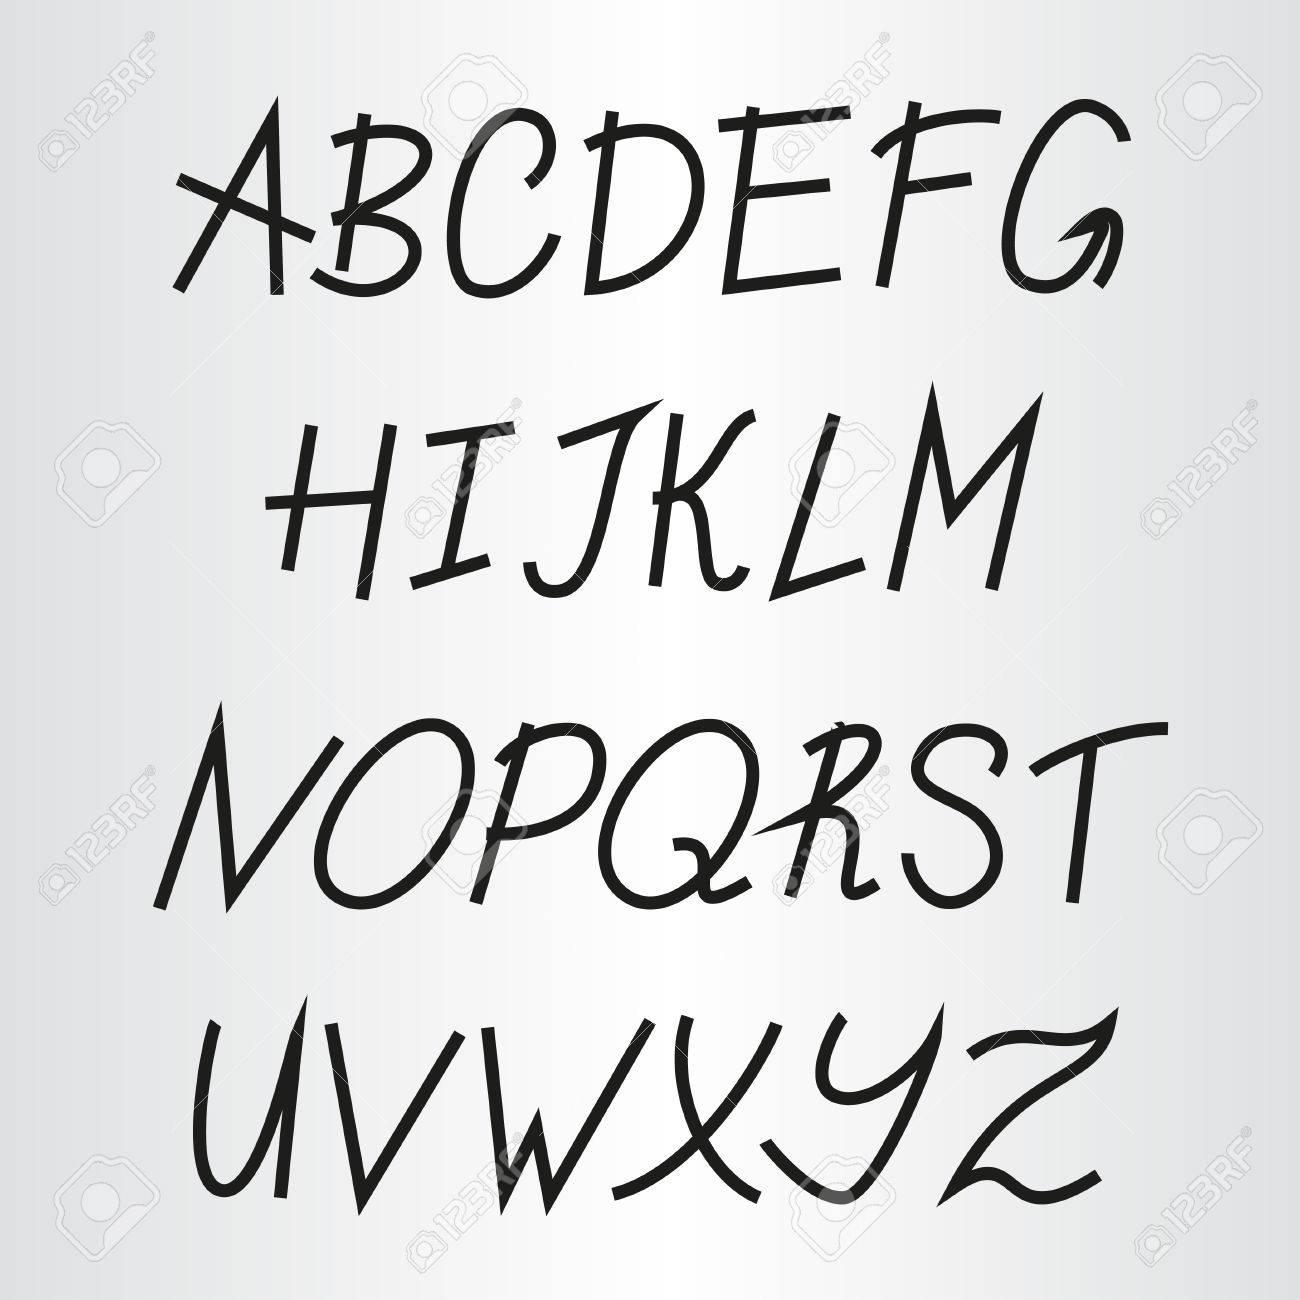 Conosciuto Caratteri Di Scrittura A Mano BK35 » Regardsdefemmes PI77